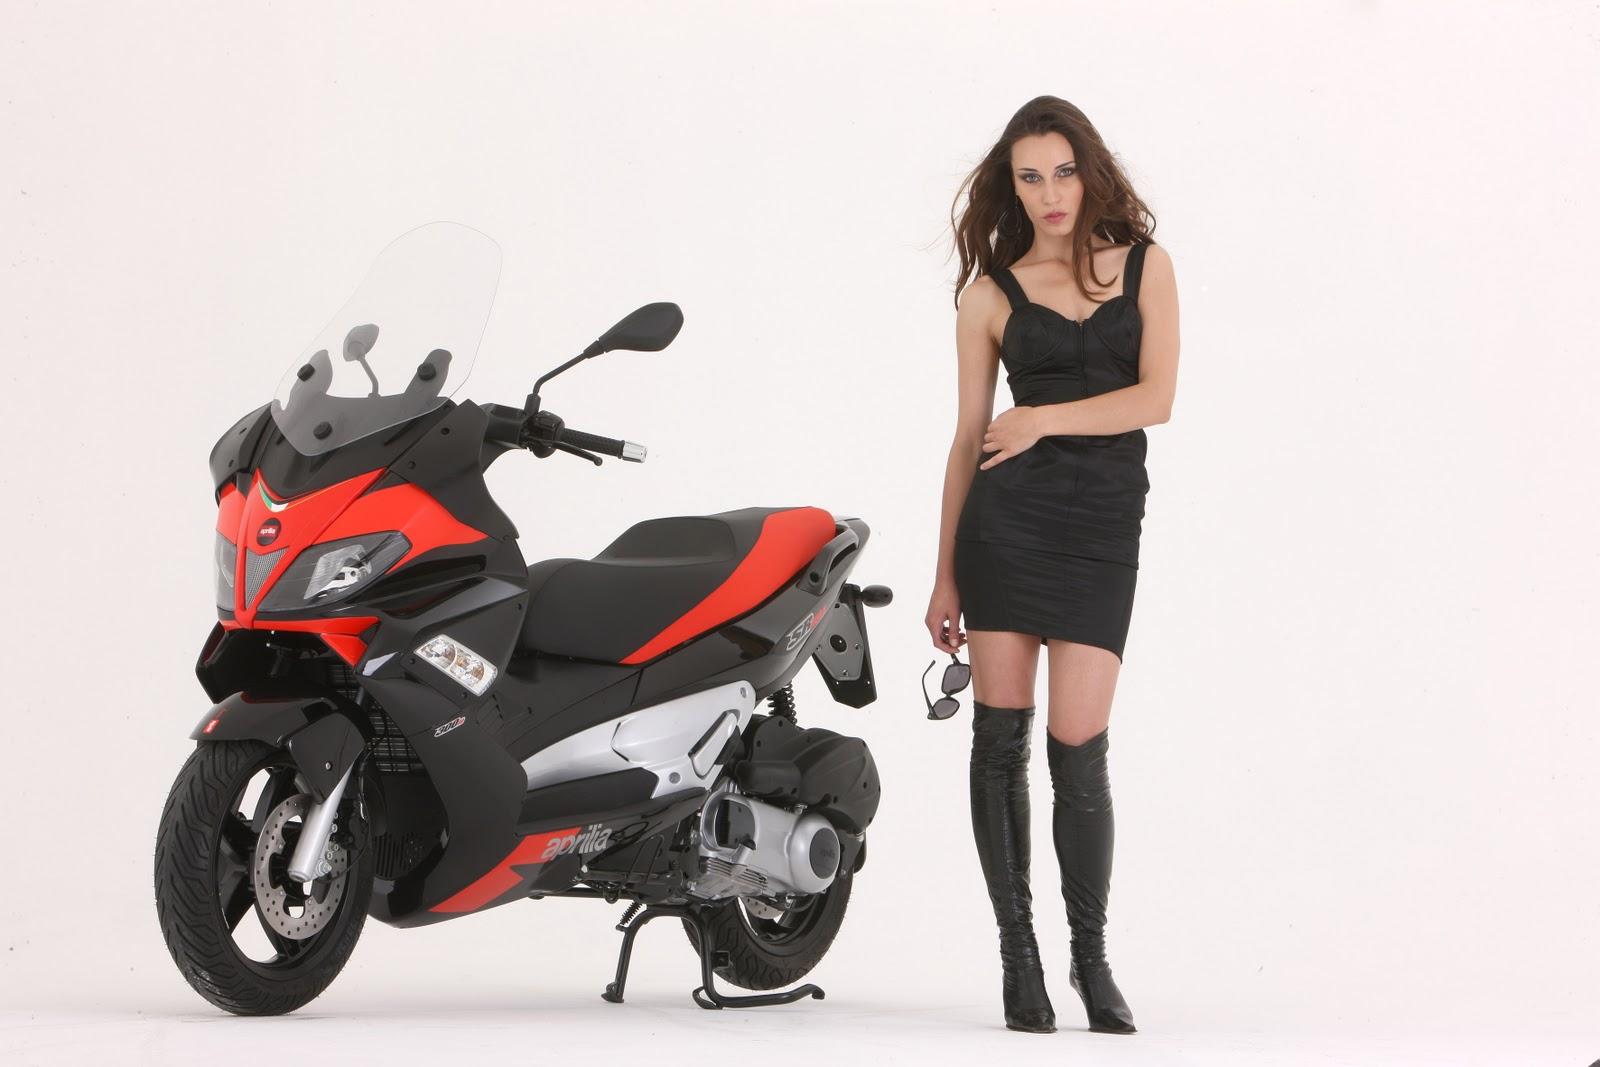 2012 Aprilia Srv 850 Best Maxi Scooter Motorboxer